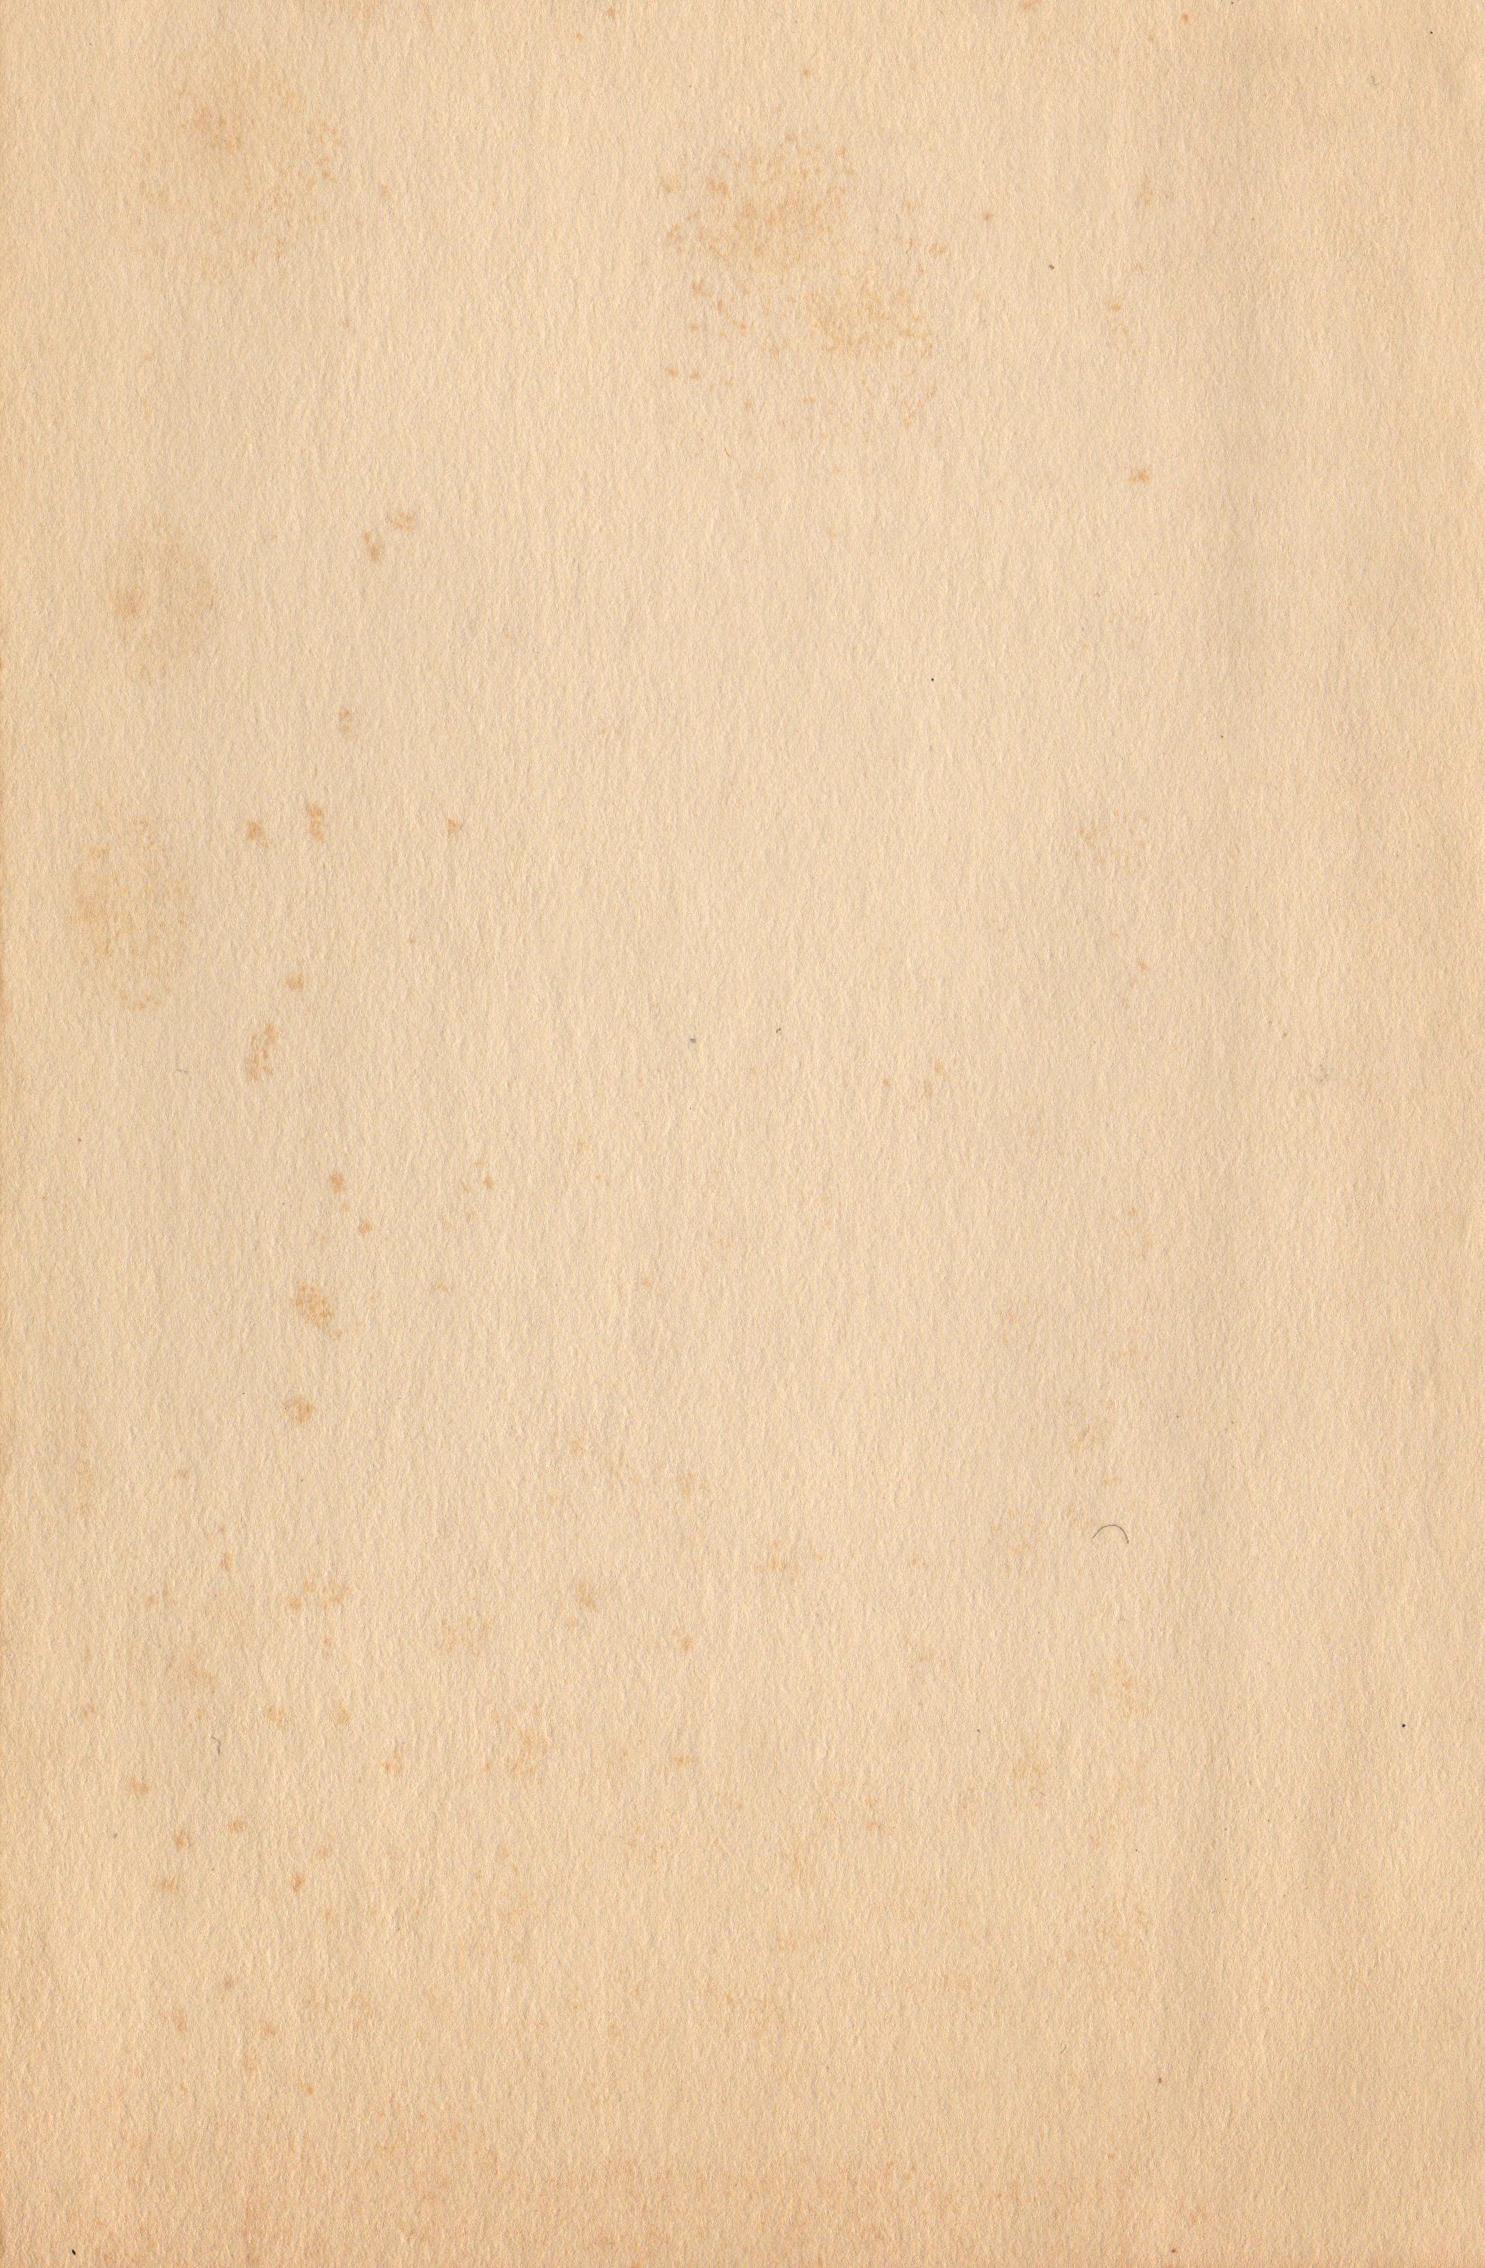 Vintage paper sheet photo